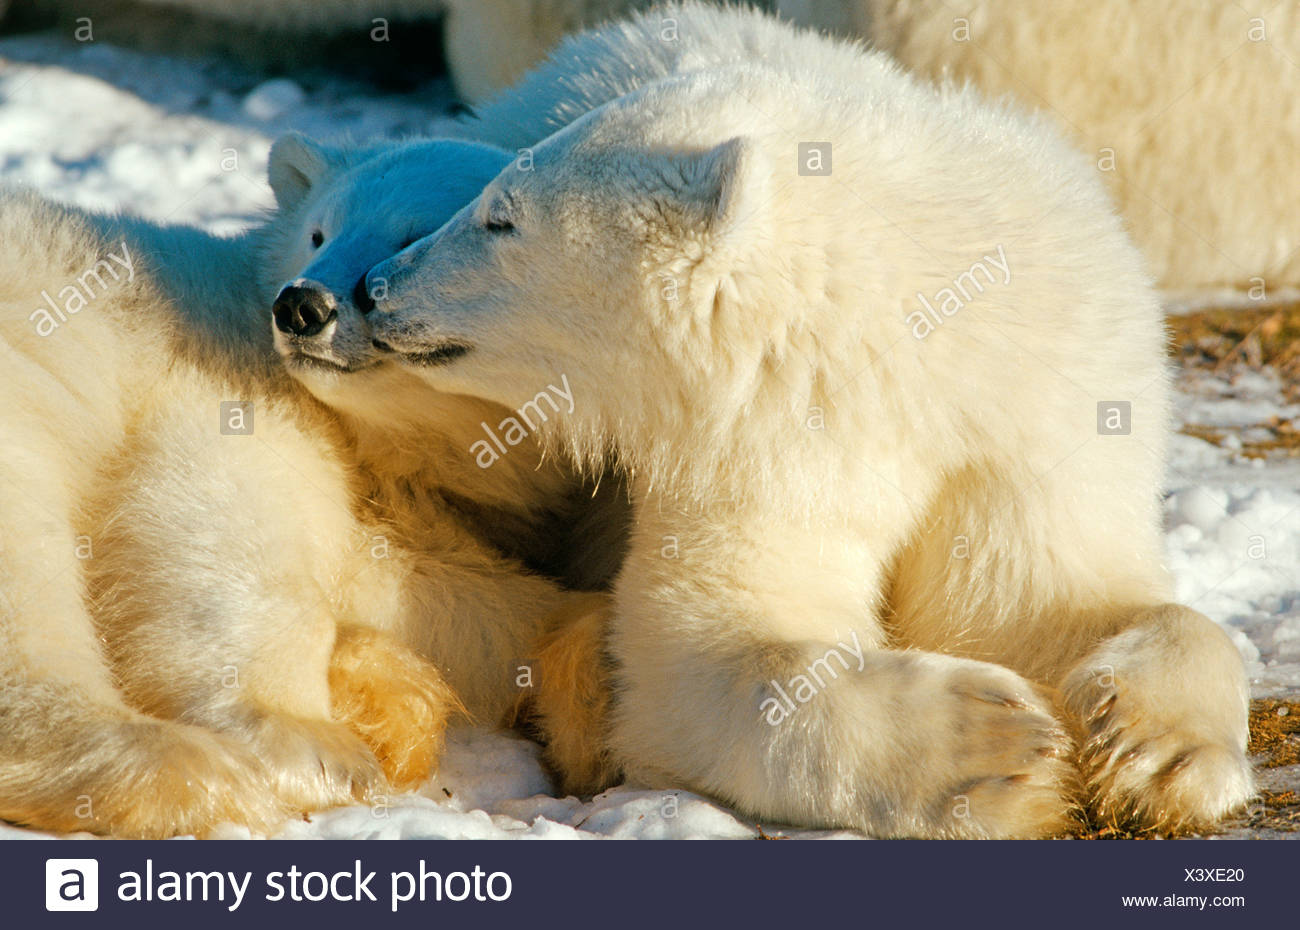 Polar bears (Ursus maritimus), family, Hudson Bay, Canada, North America Stock Photo